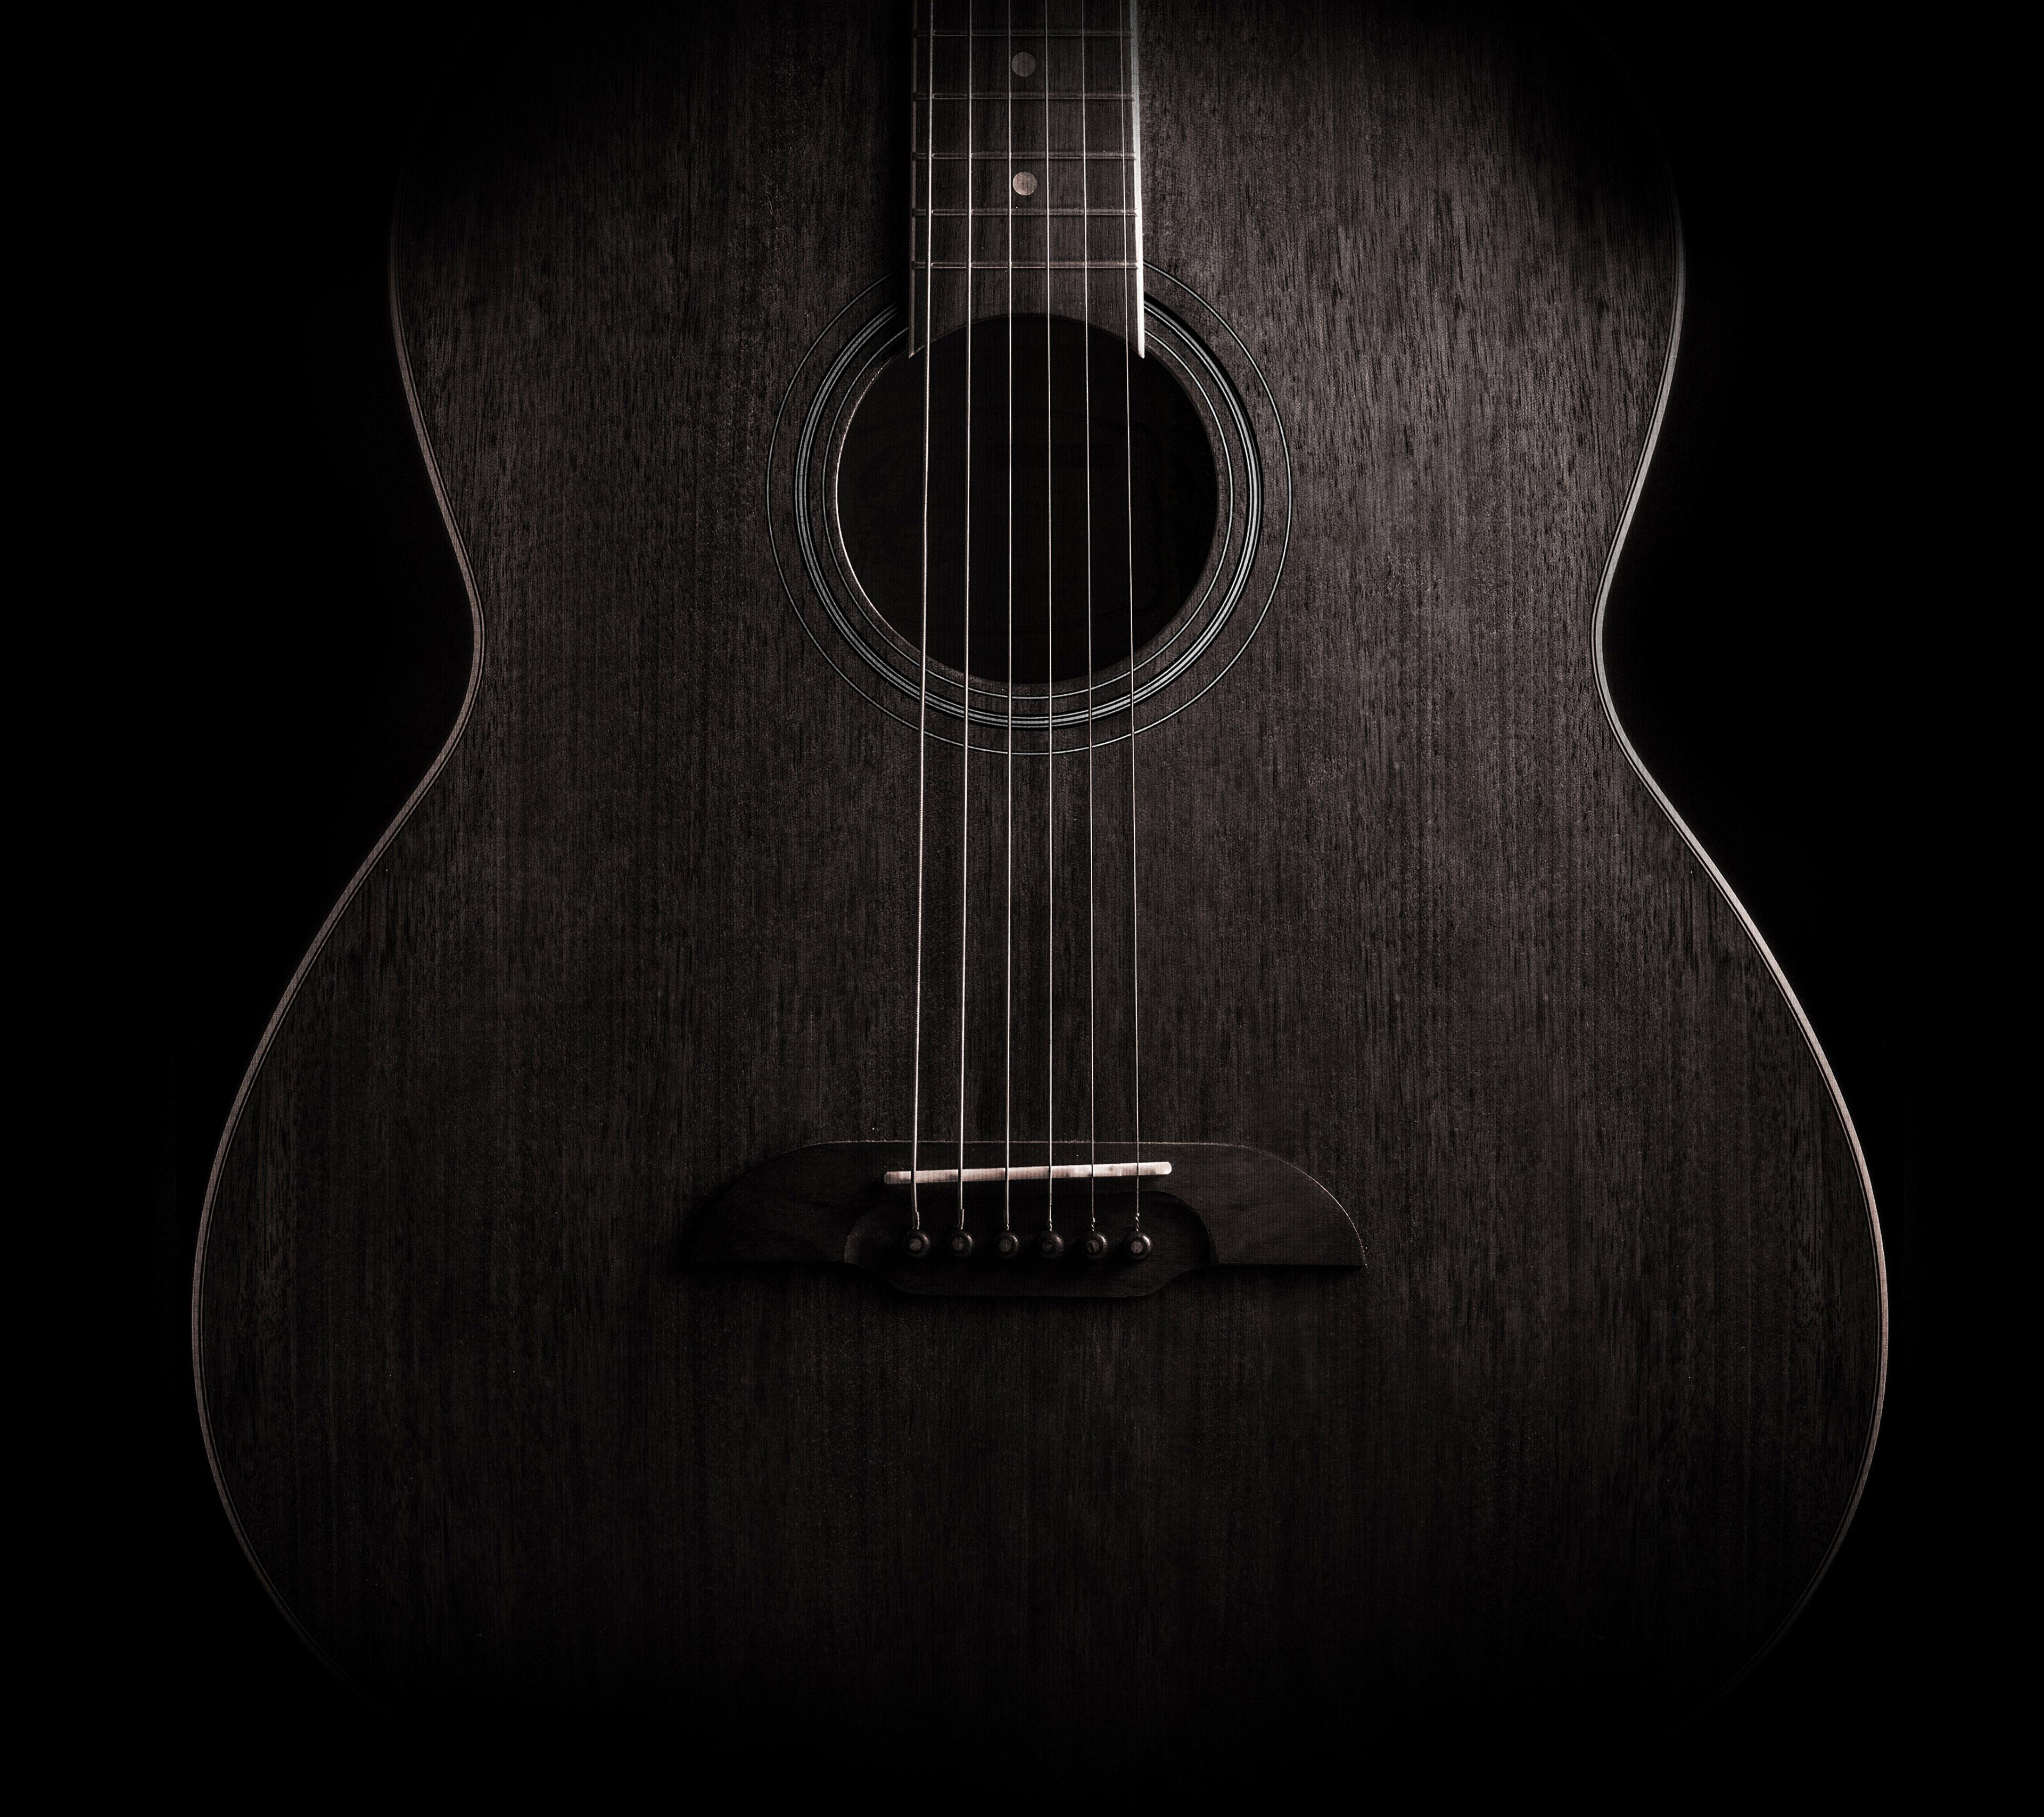 Guitar Dark Music Instrument 4K Wallpaper - Best Wallpapers